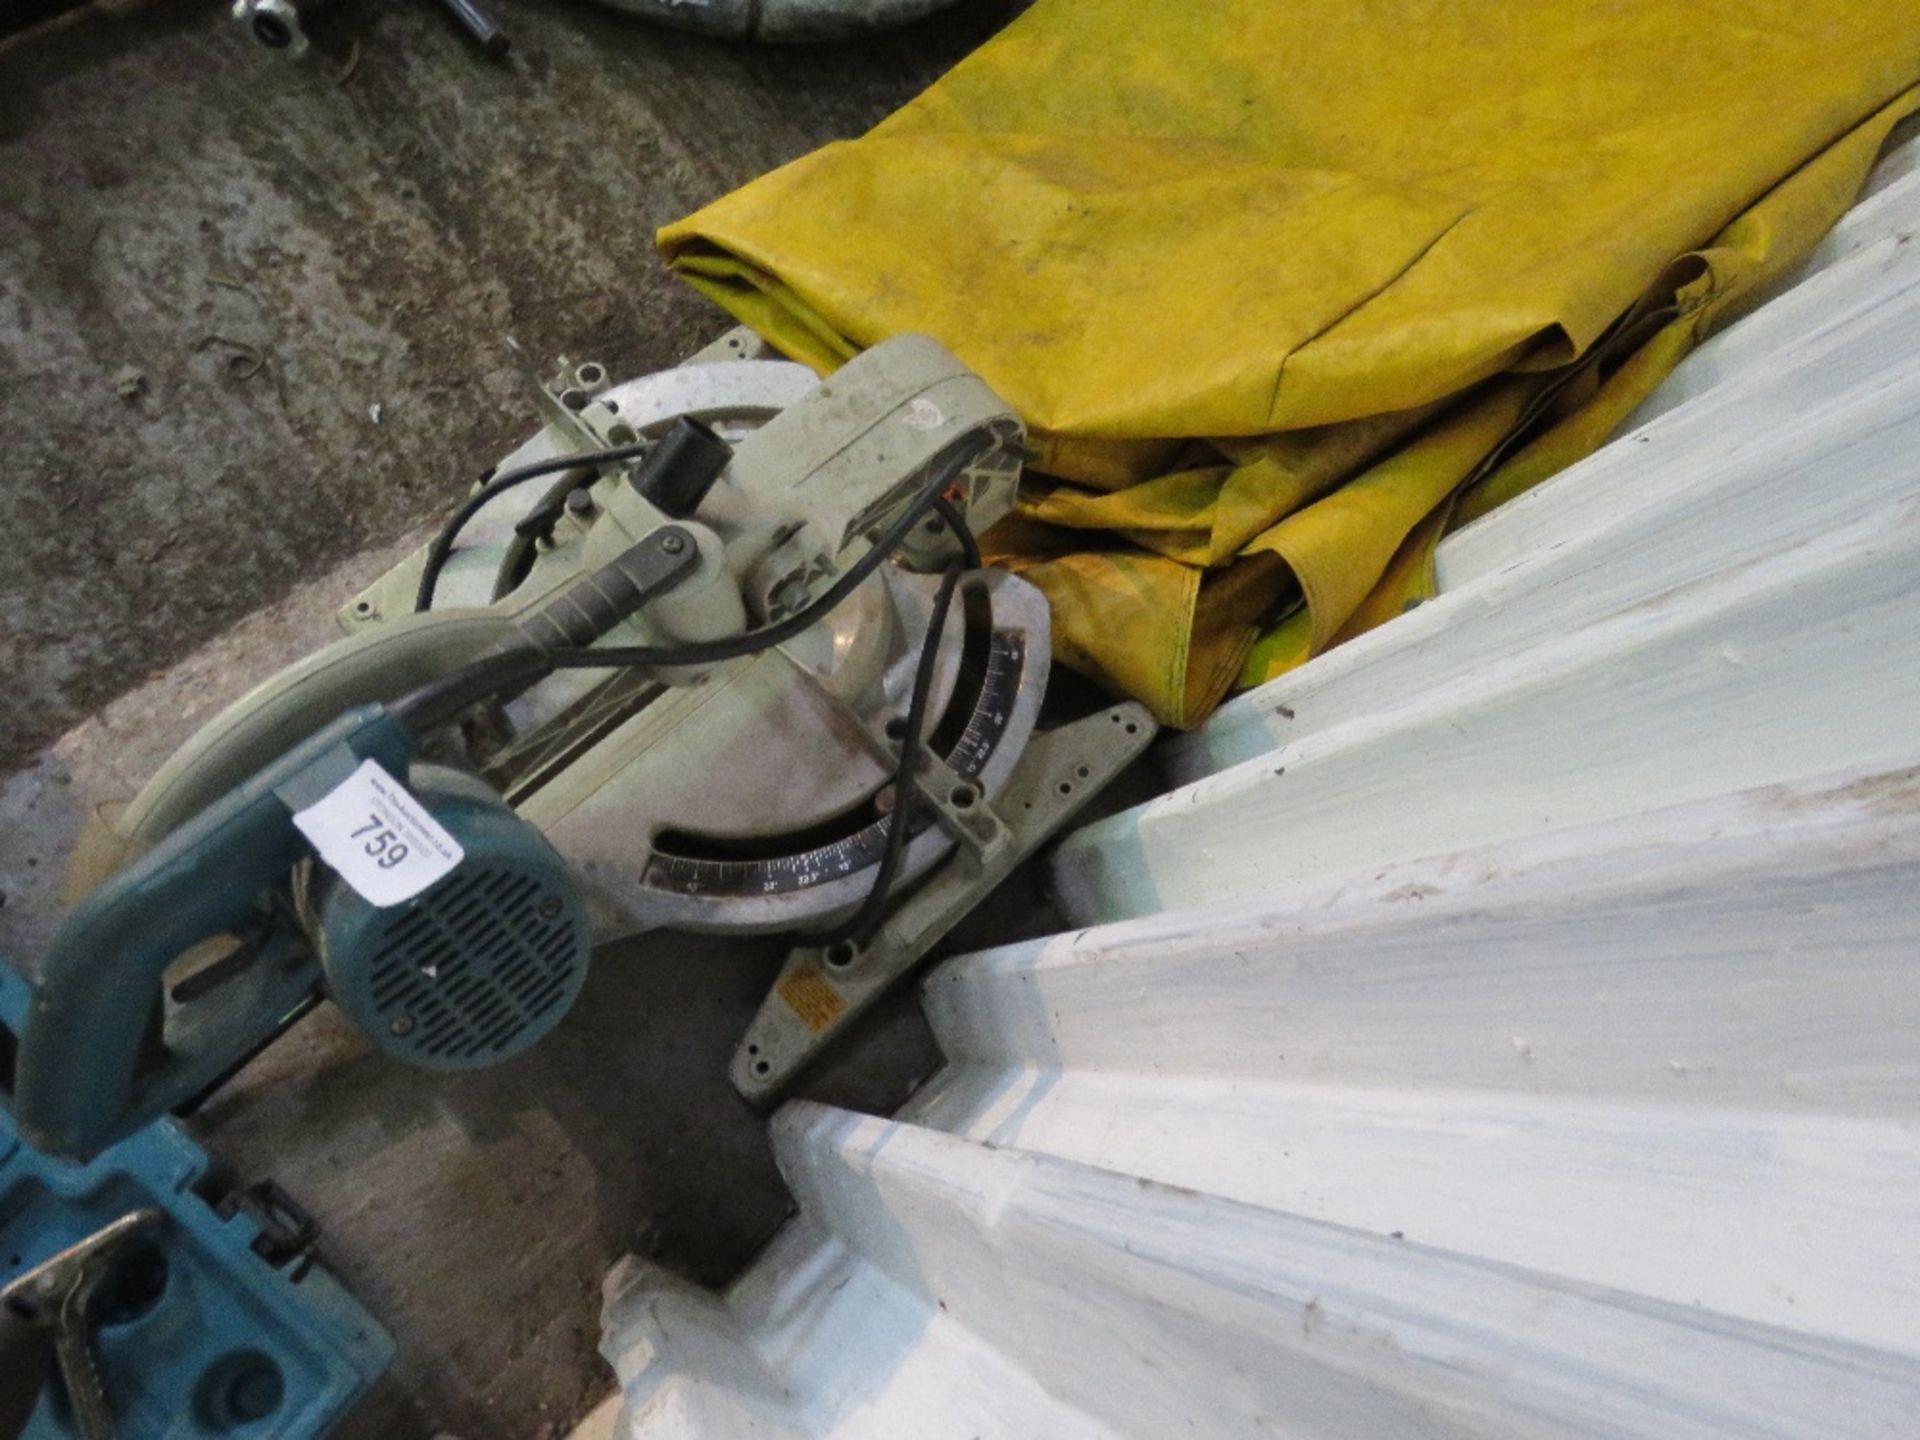 Lot 759 - Makita 110v mitre saw